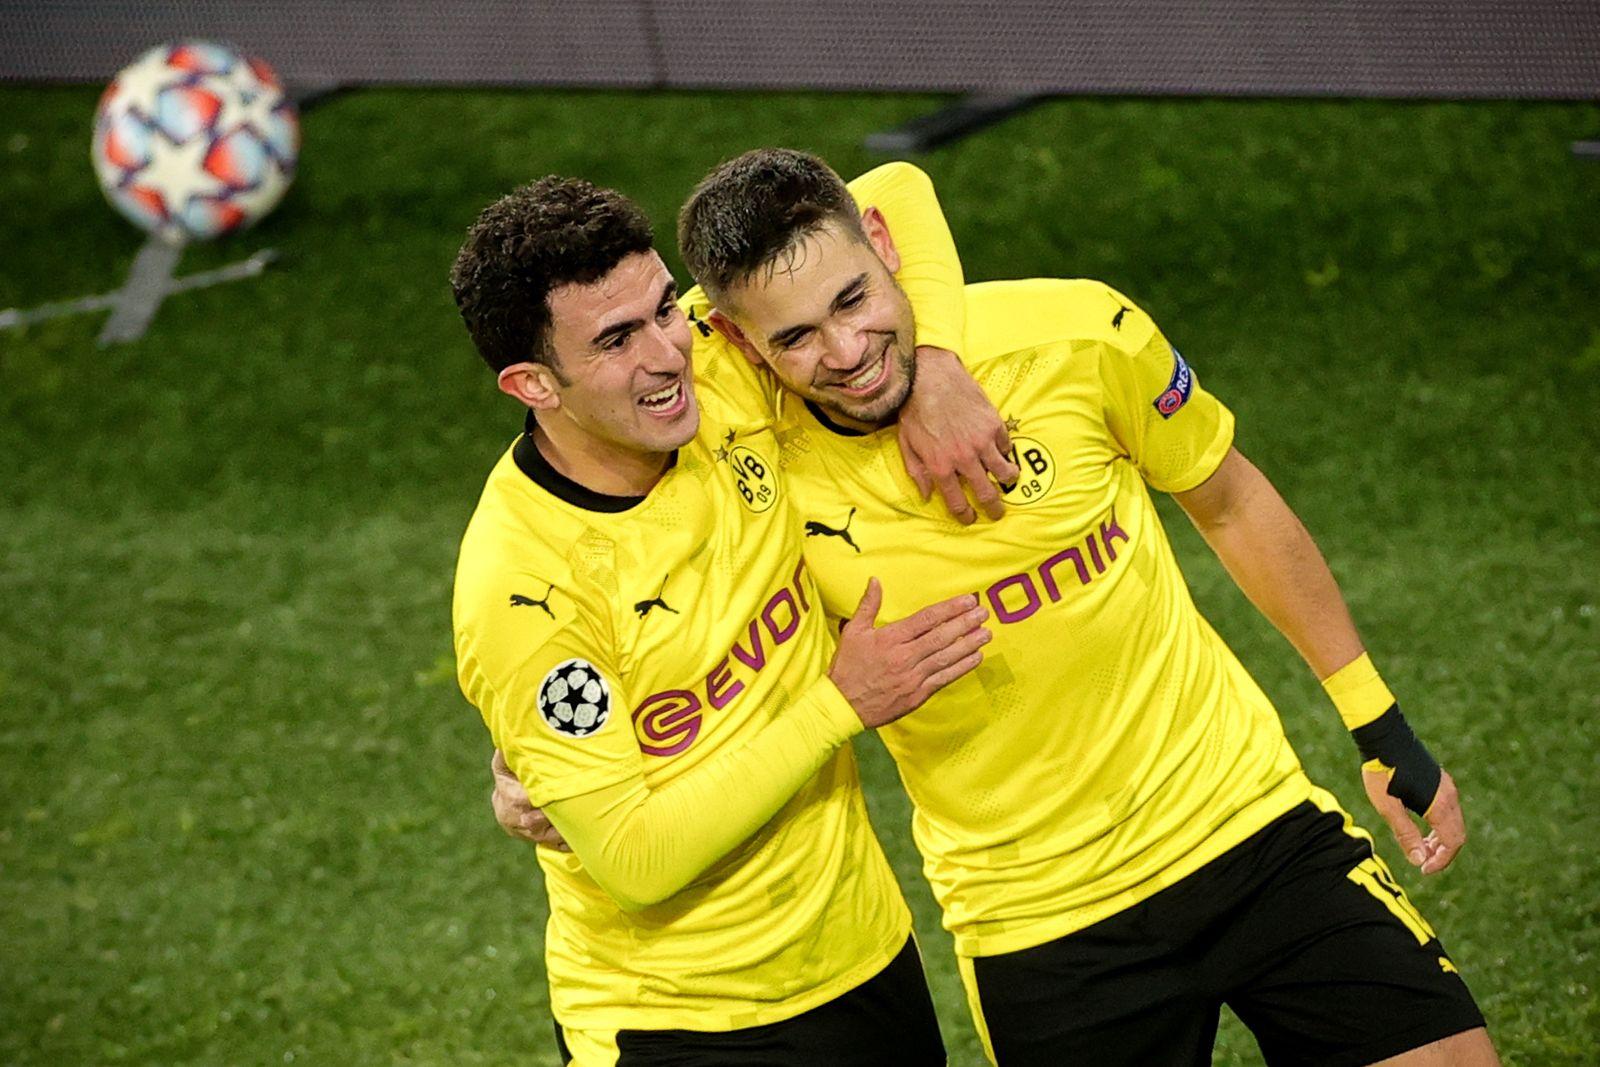 Borussia Dortmund vs SS Lazio, Germany - 02 Dec 2020